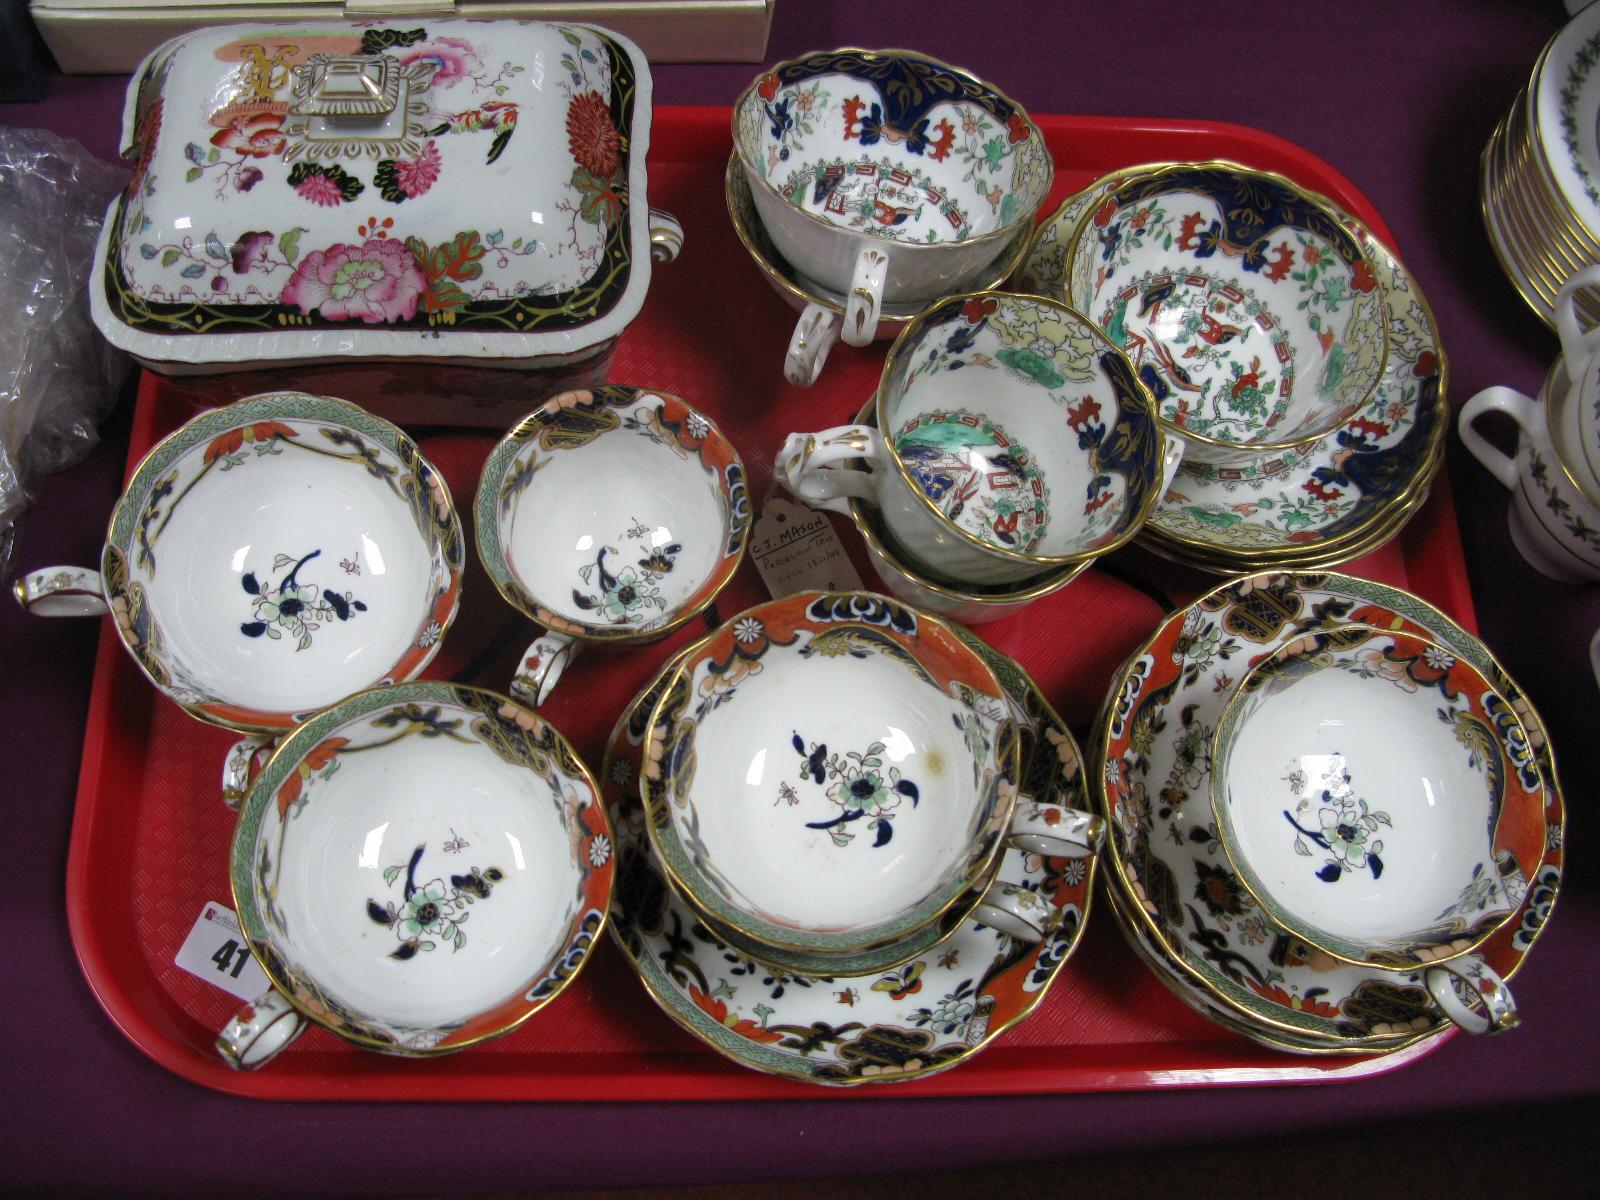 Lot 41 - Mason's Teaware, sauce tureen, etc:- One Tray